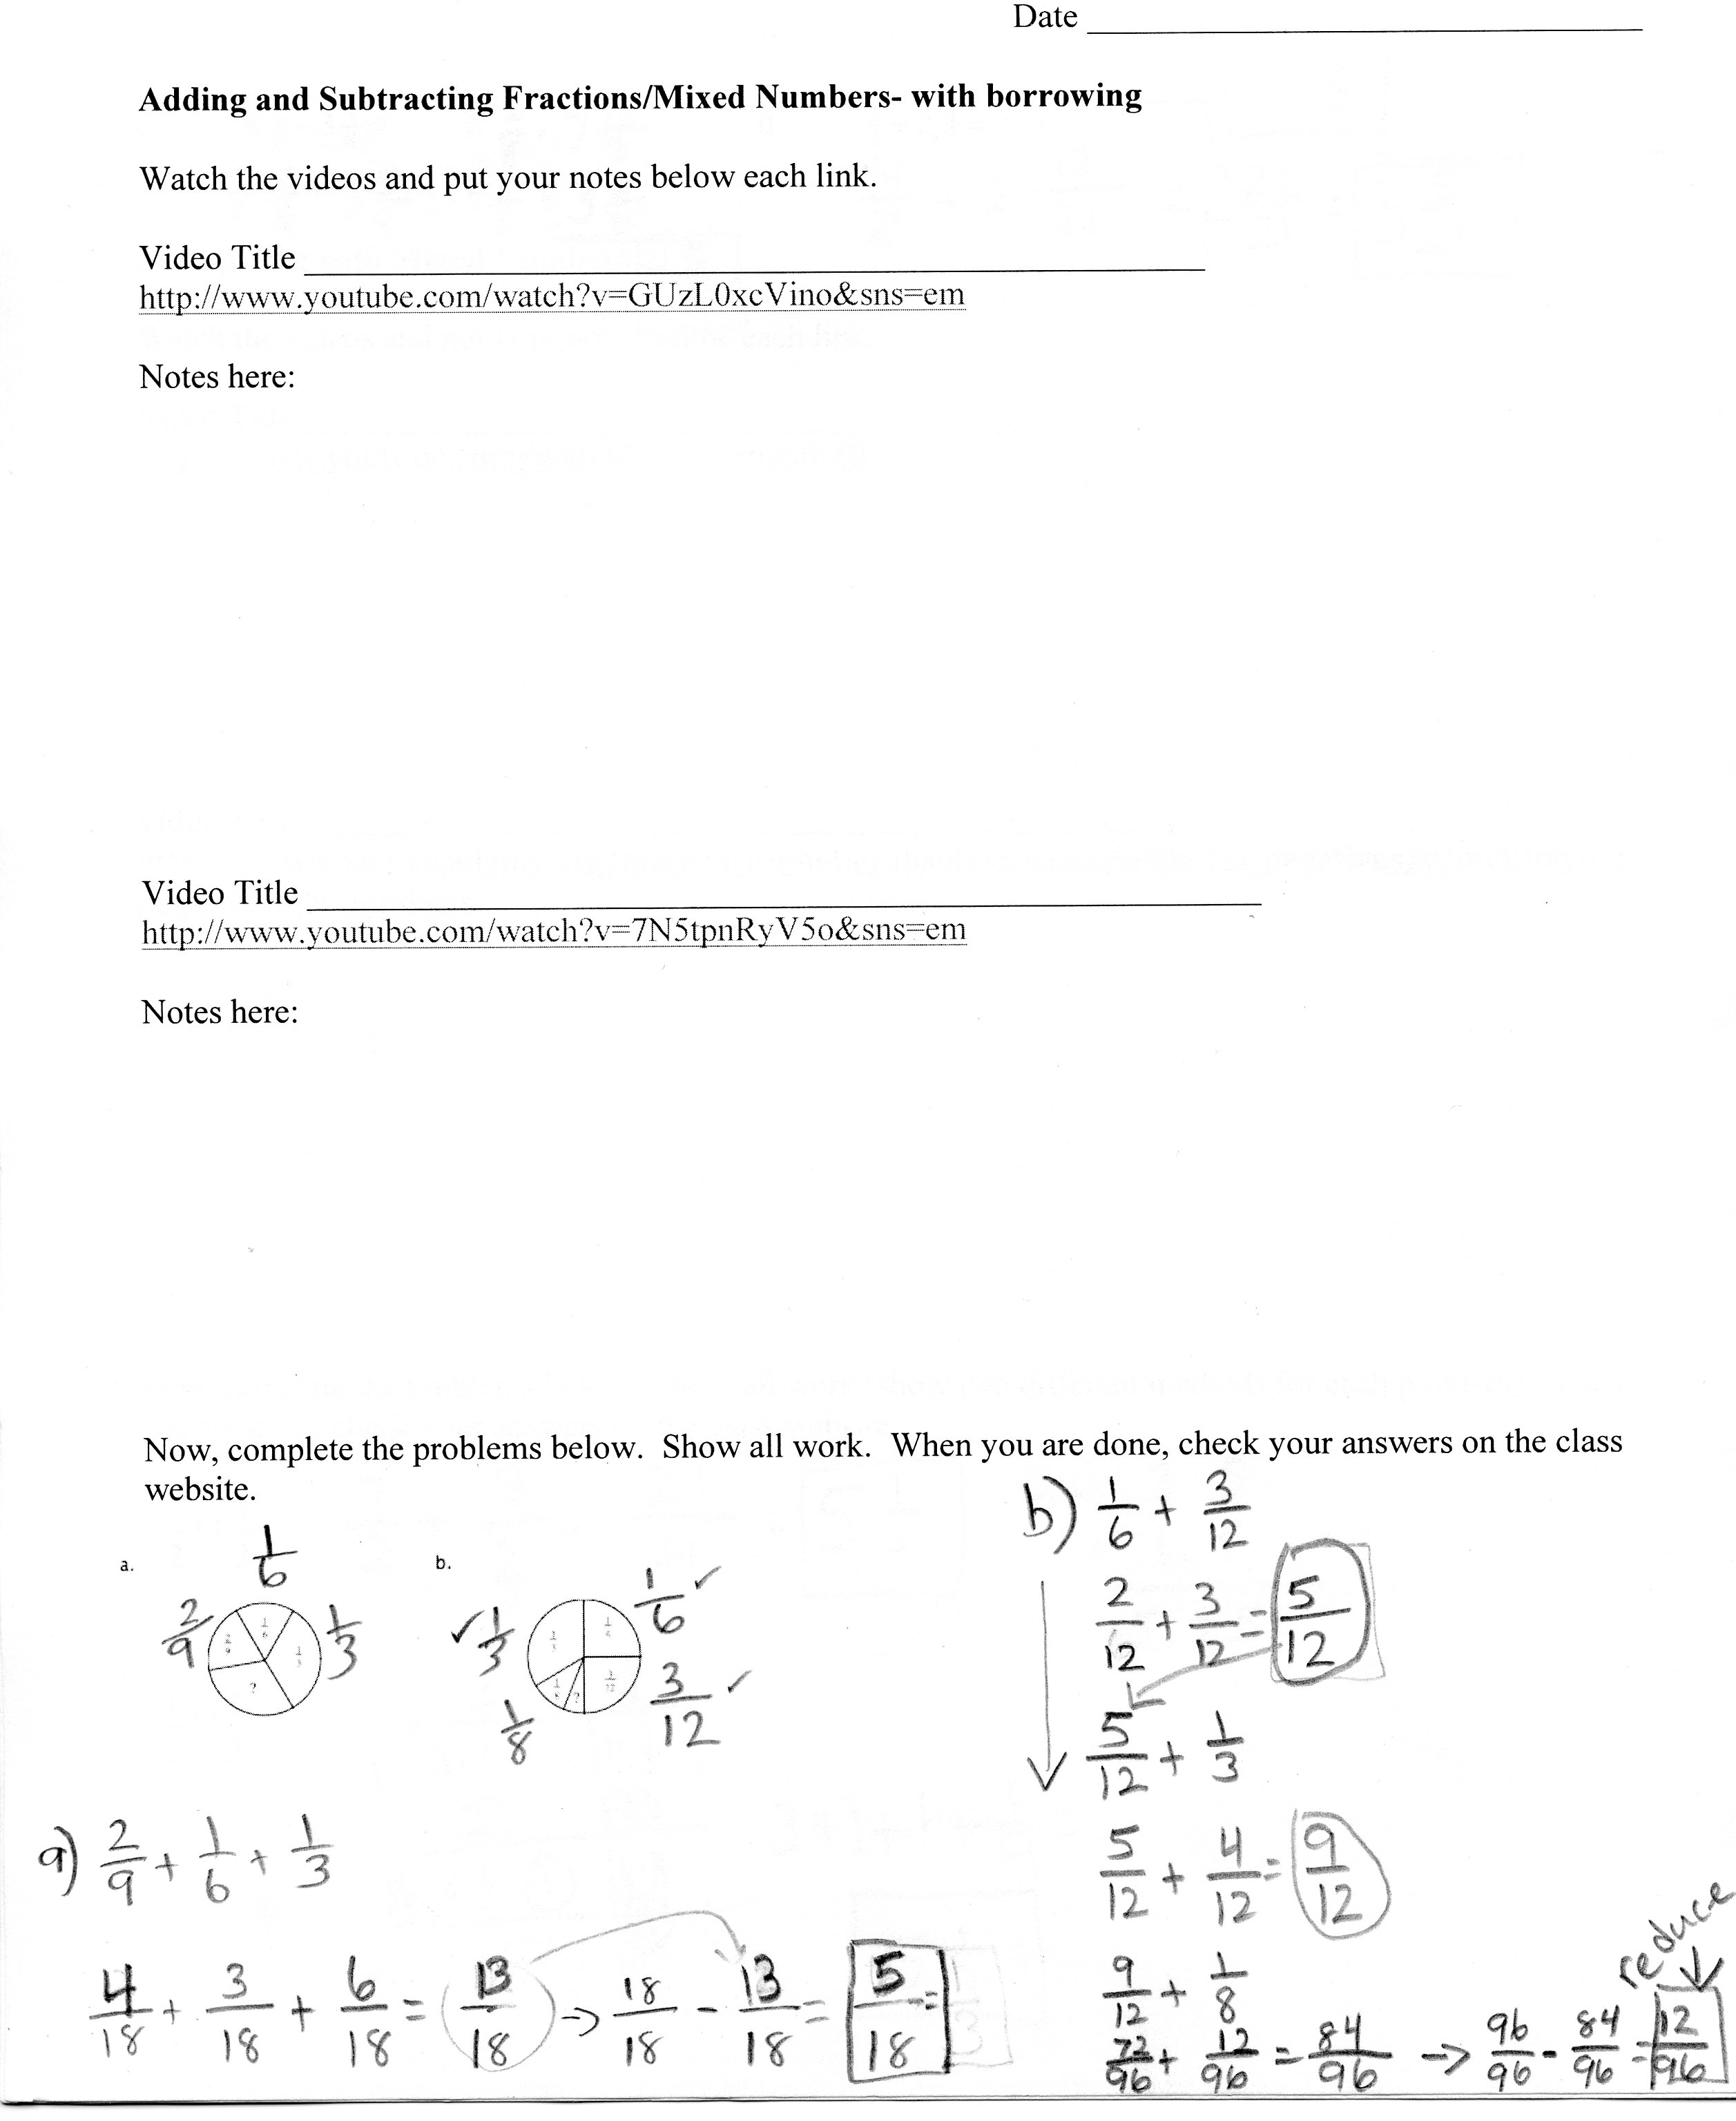 Patterson Brandolyn Homework Amp Class Work 1st 2nd 3rd Trimester Through 5 8